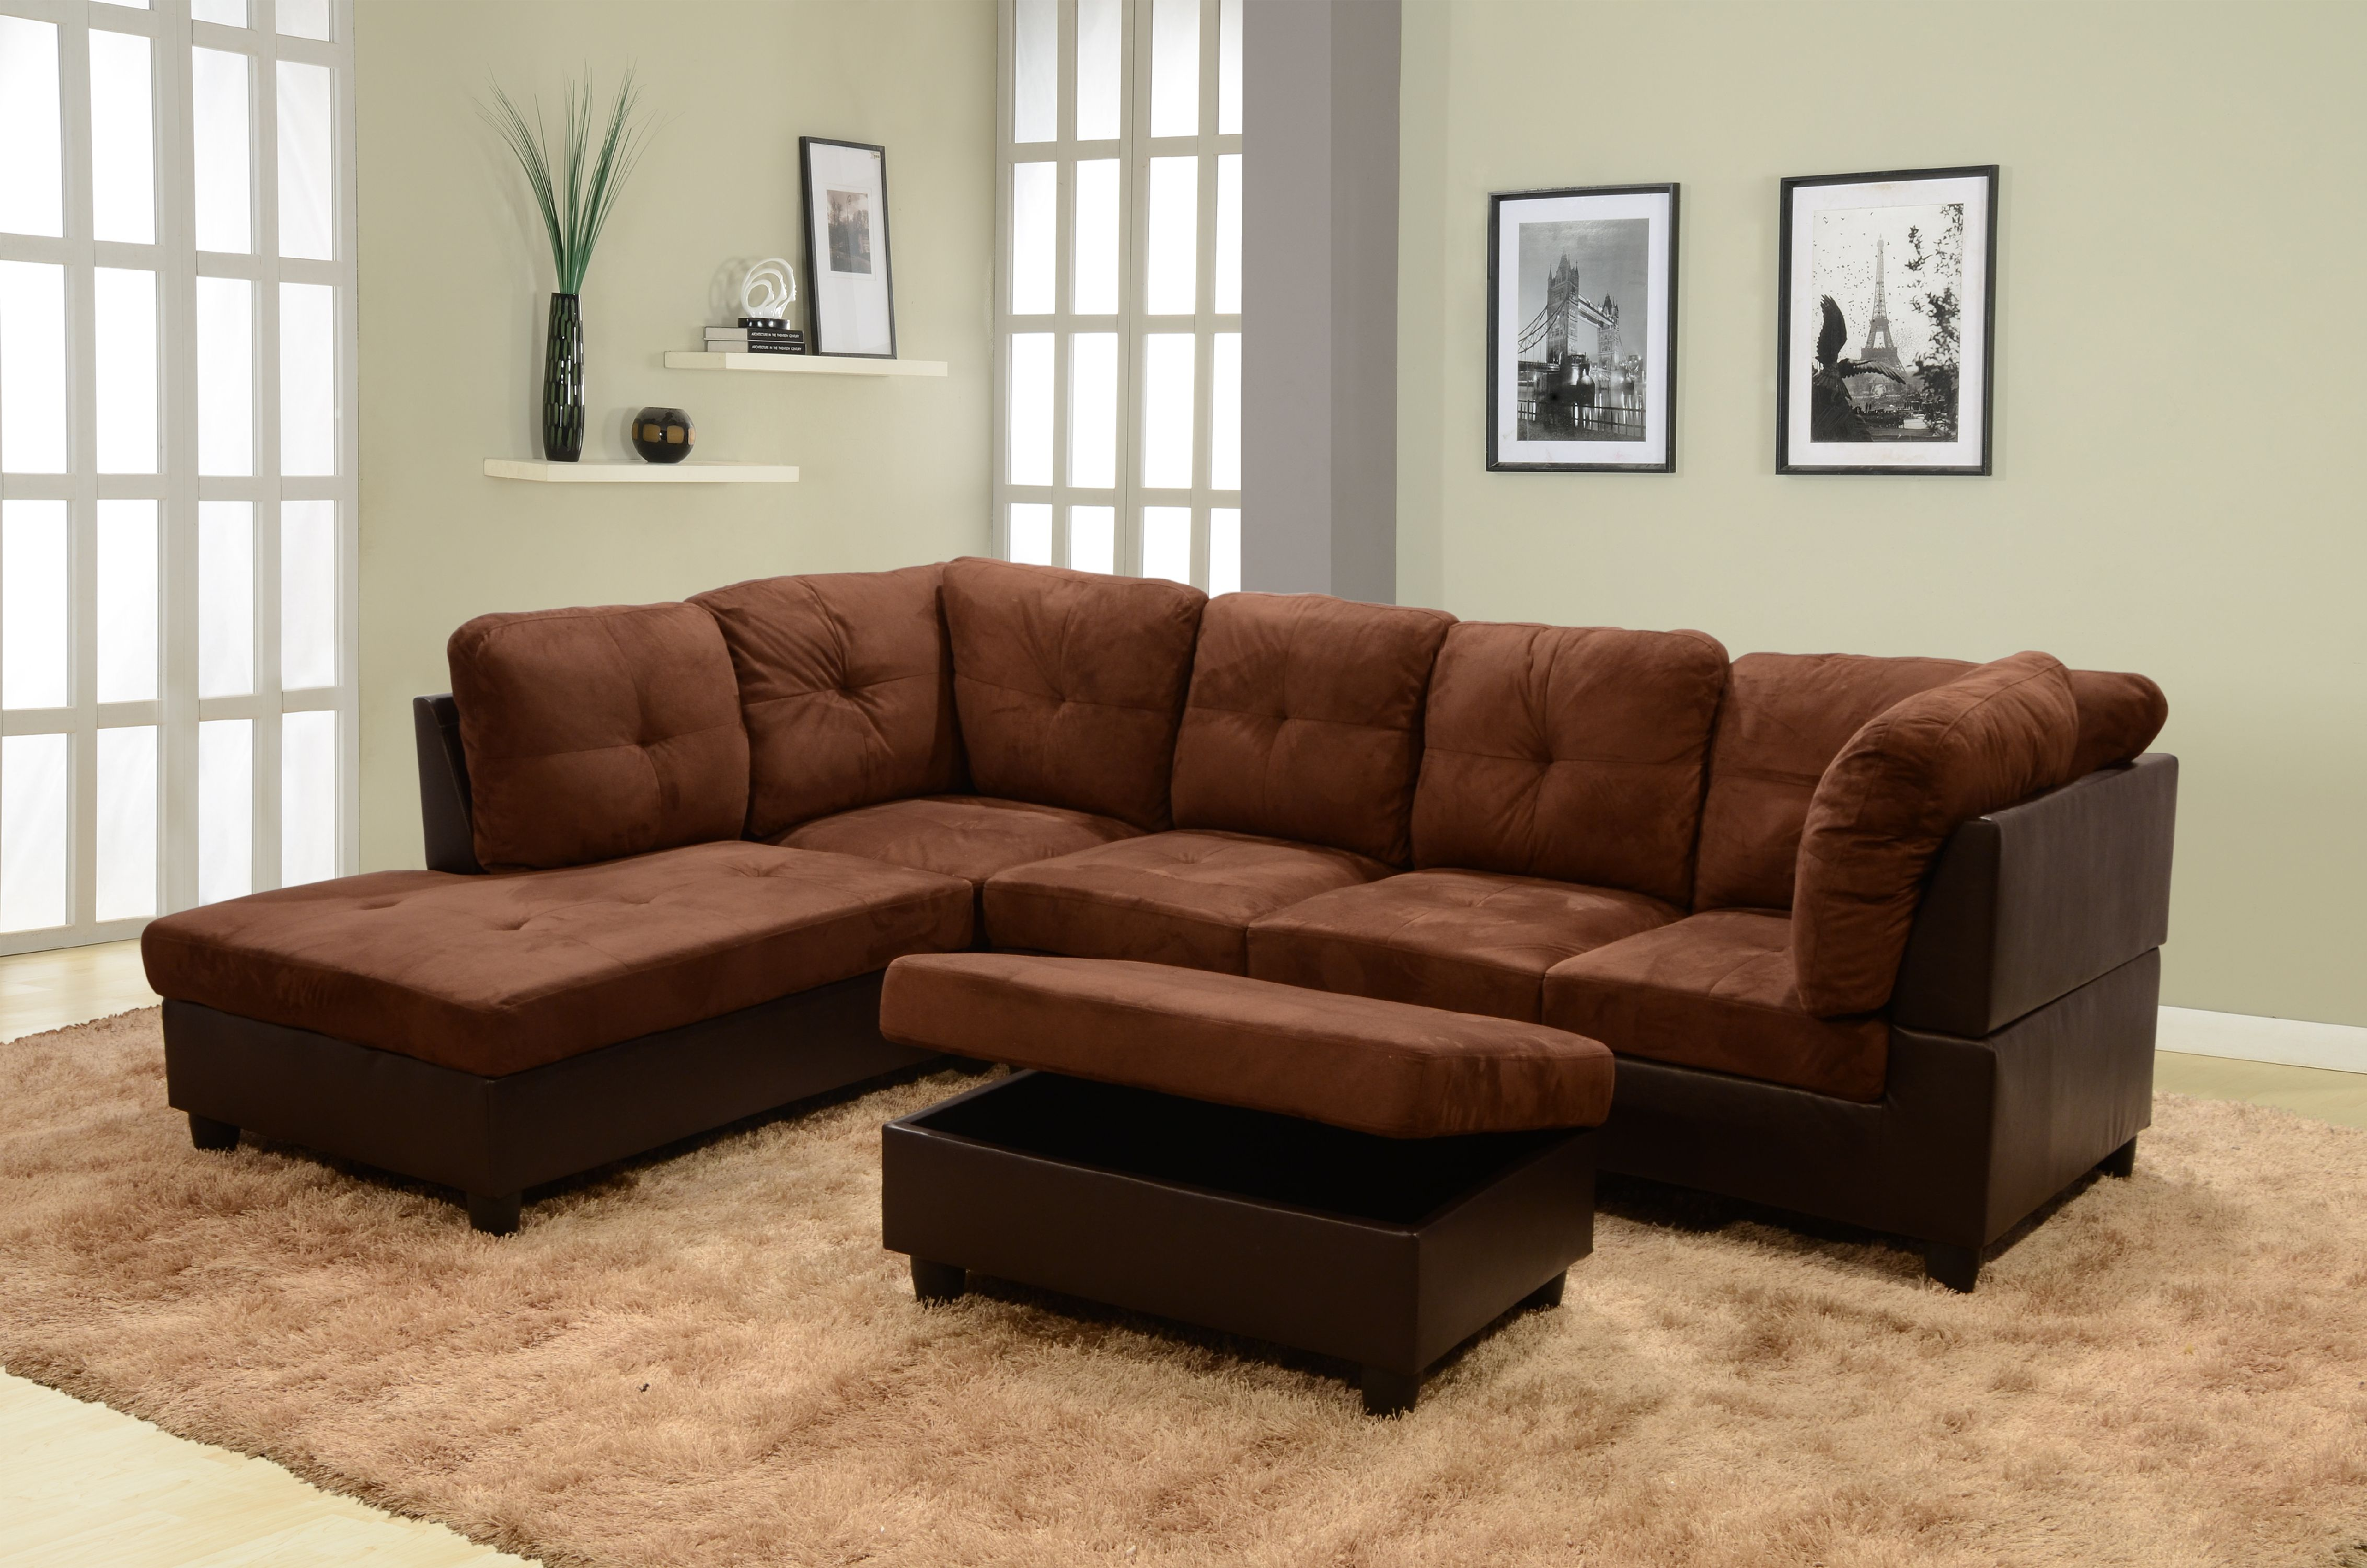 Cruz Left Facing Sectional Sofa with Ottoman, Chocolate